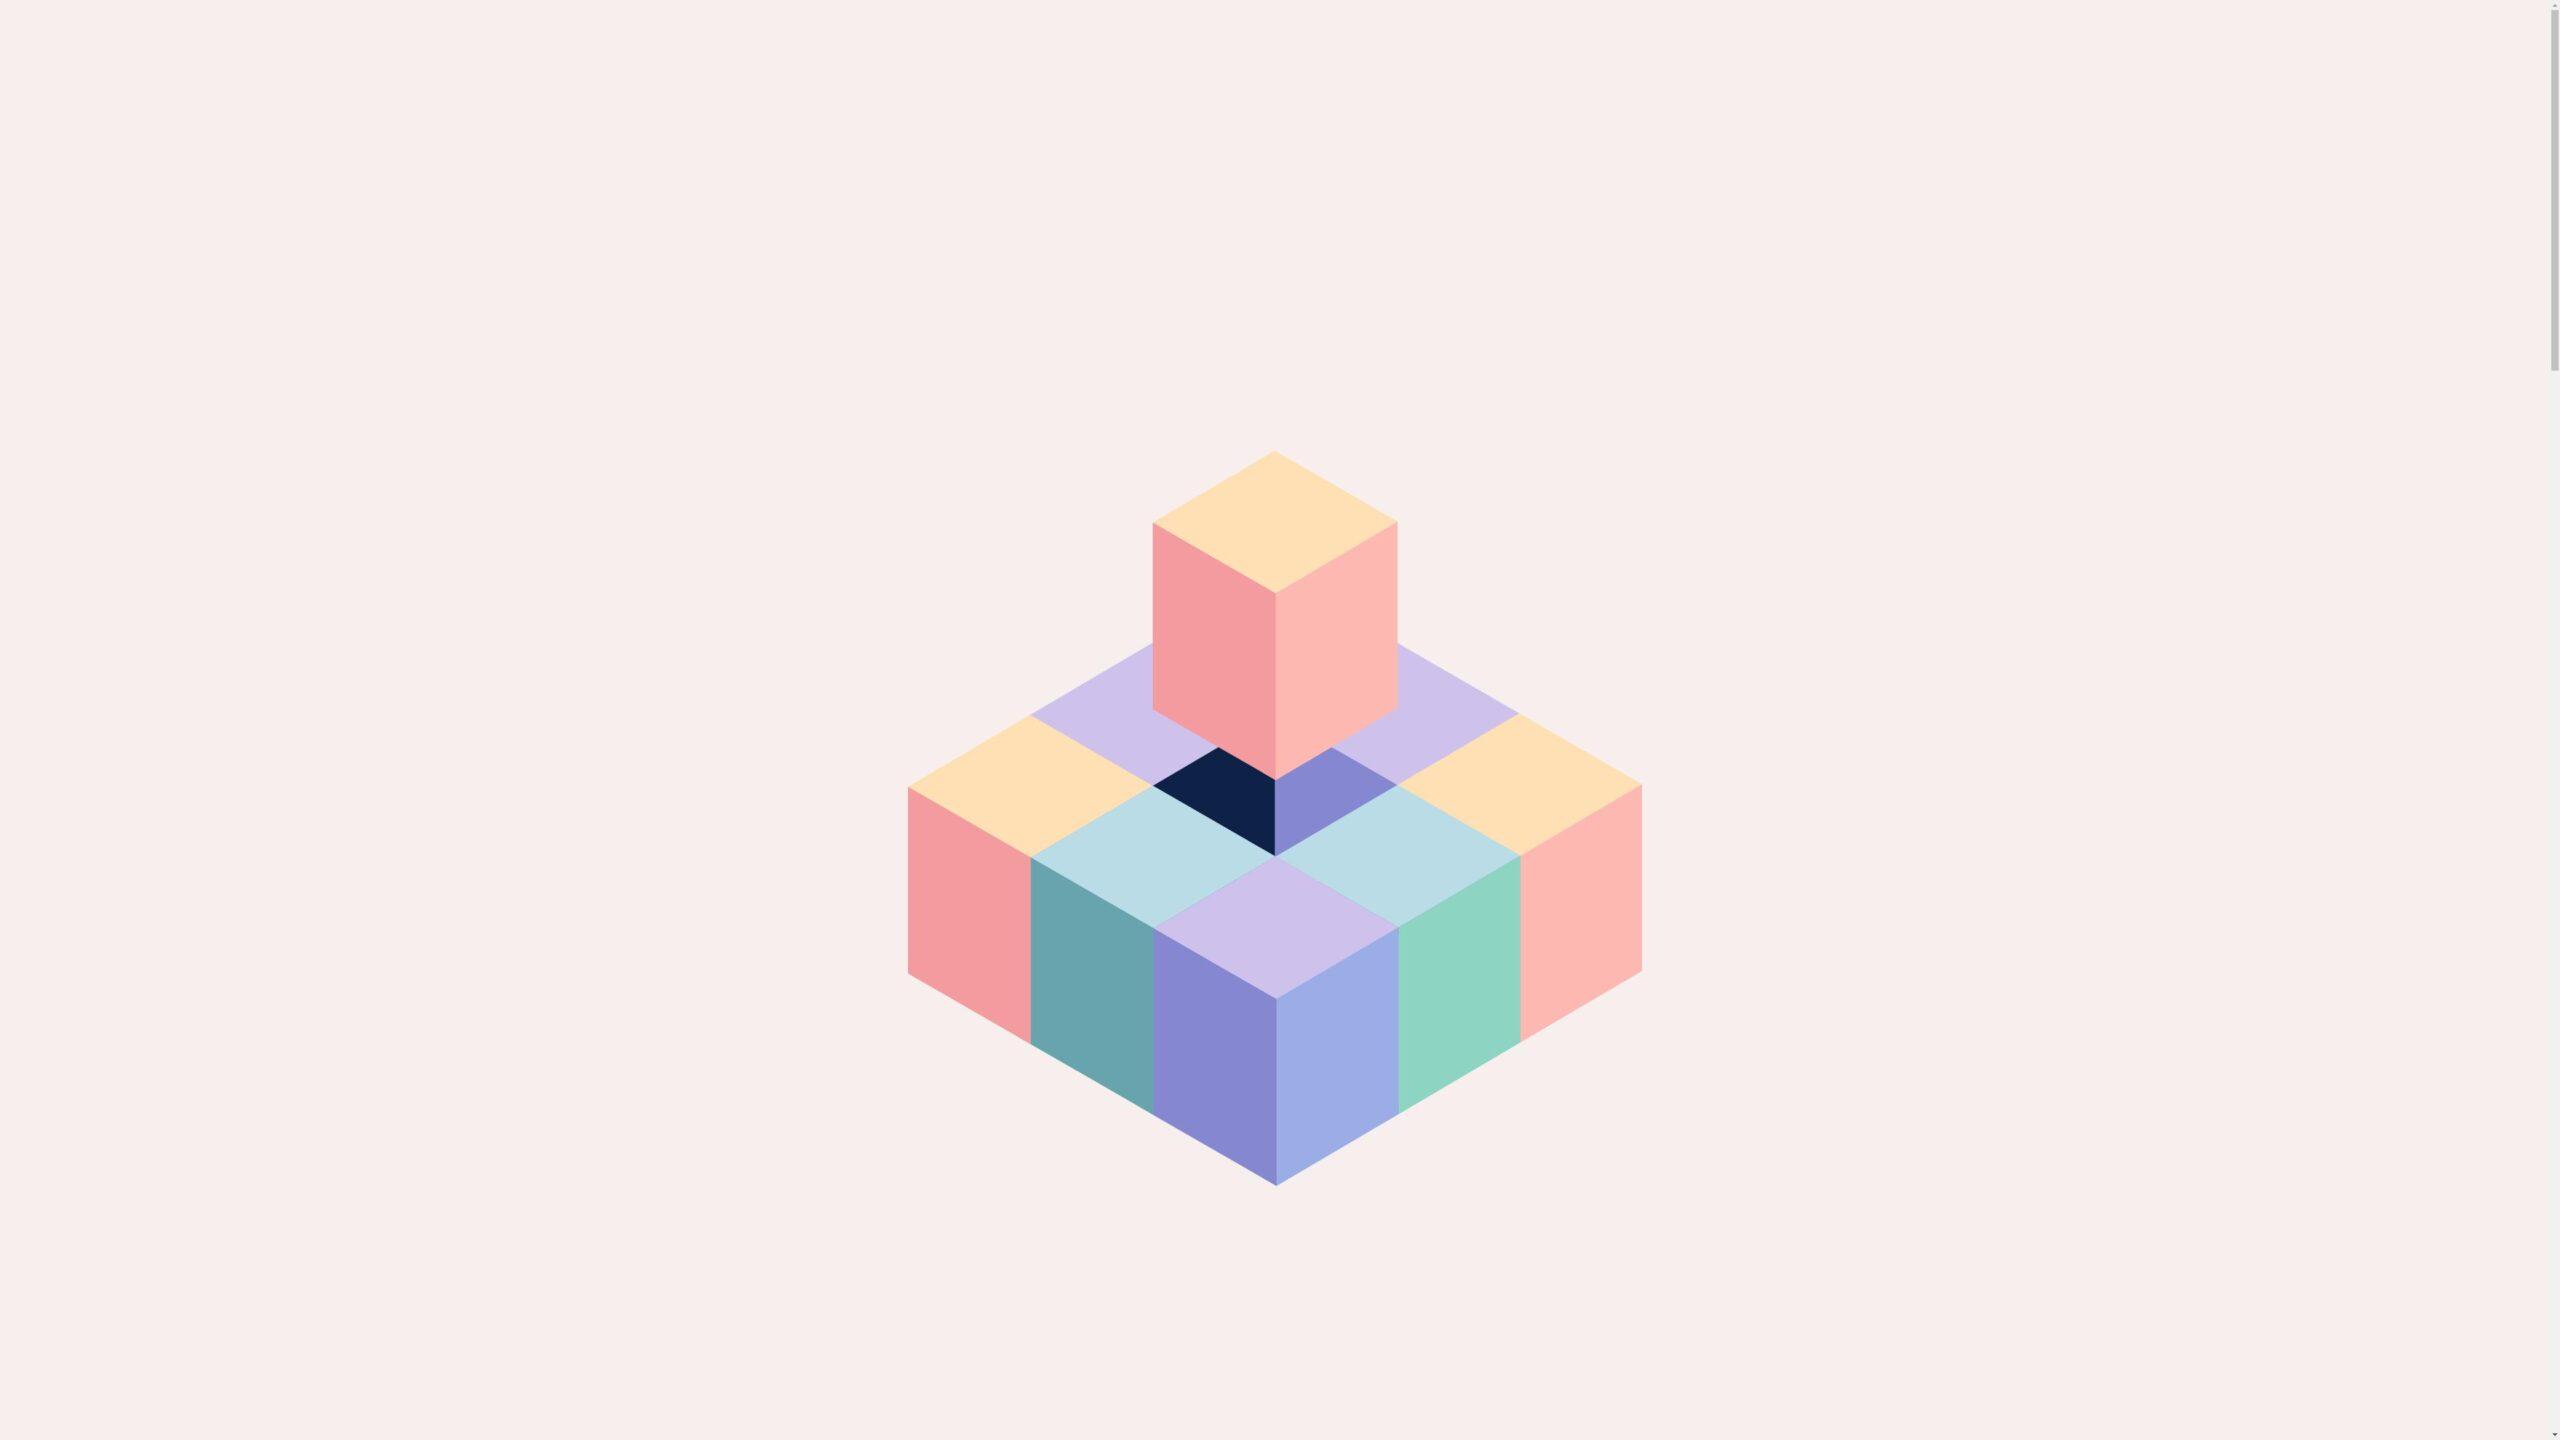 Orpetron Web Design Awards - Adam Church - Web Design Awards Inspiration Trends UI UX